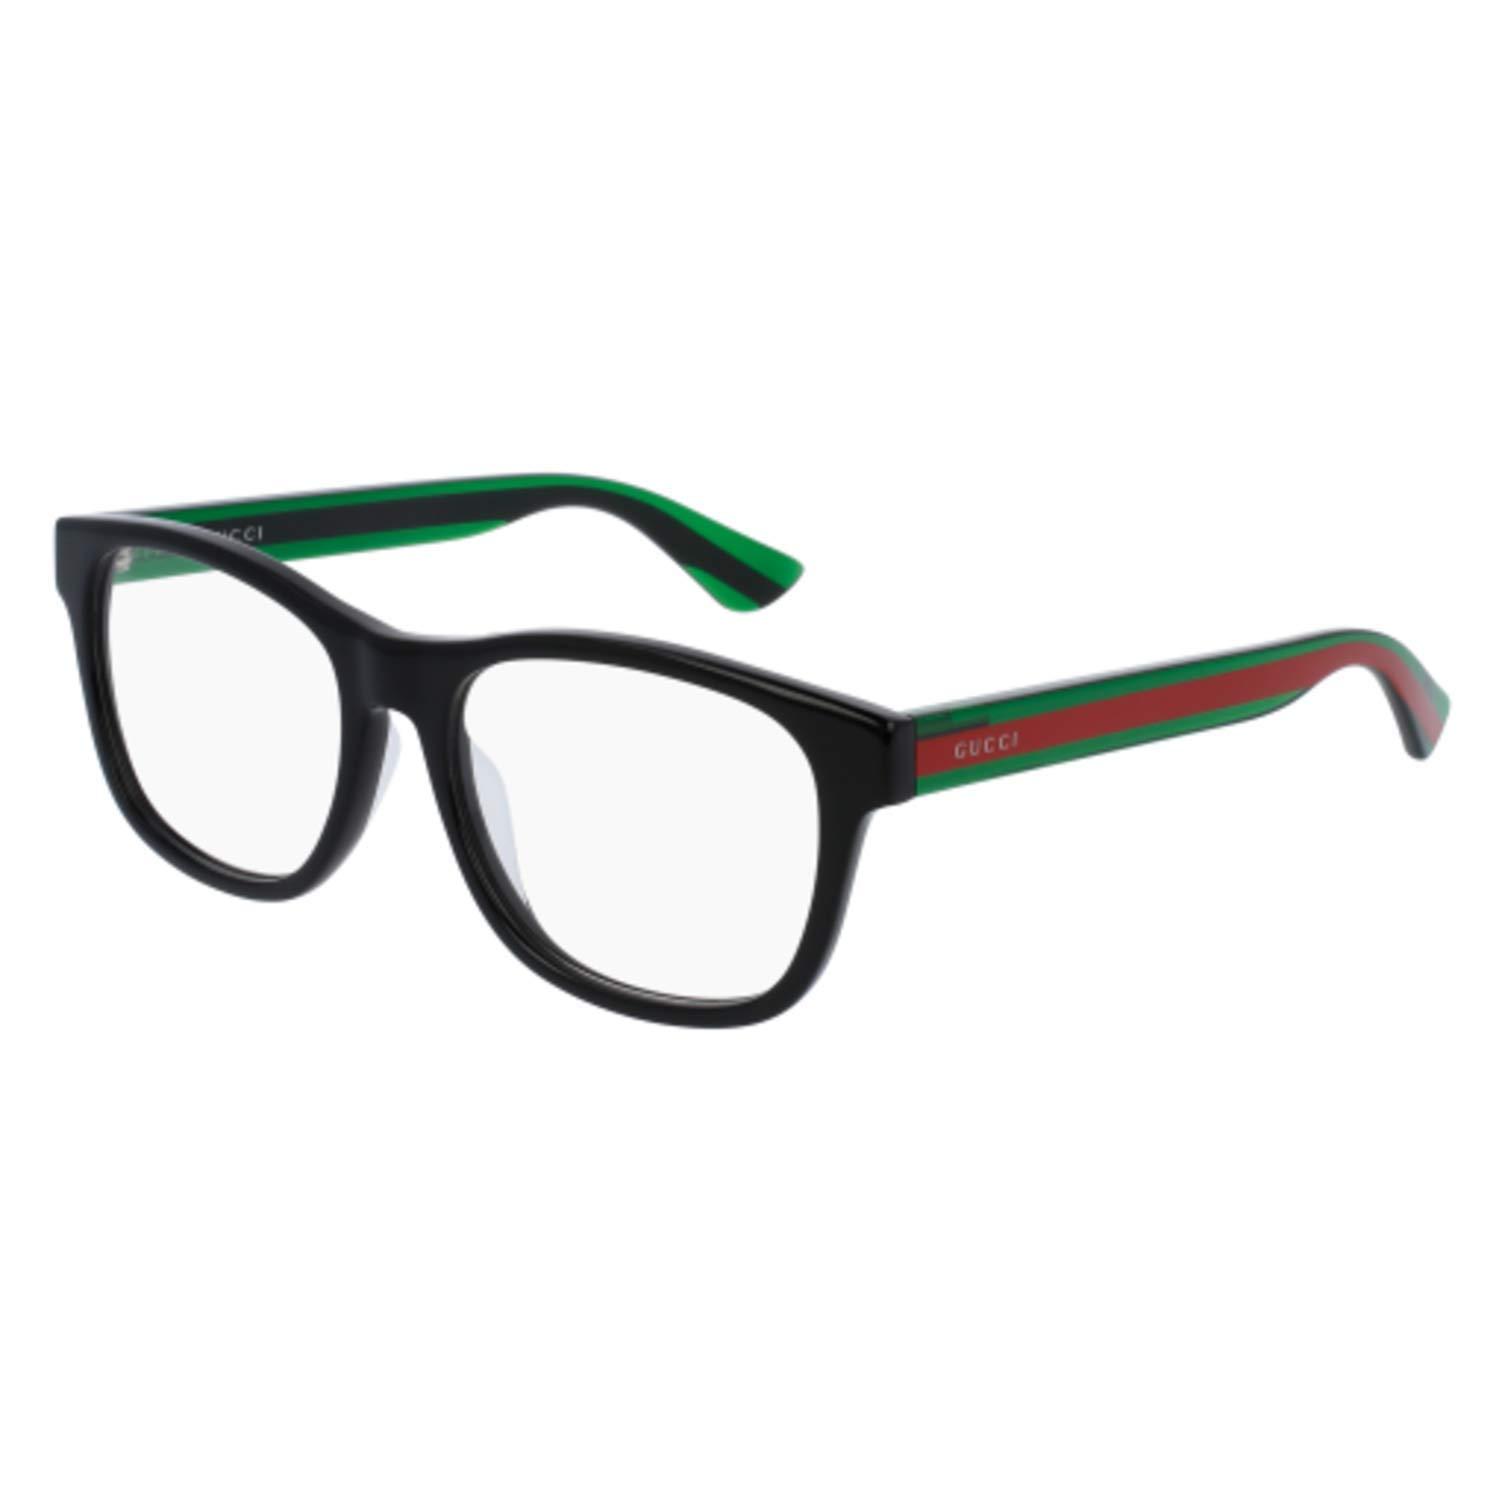 f6e65a62413 Gucci GG 0004OA 002 Asian Fit Black Plastic Square Eyeglasses 55mm